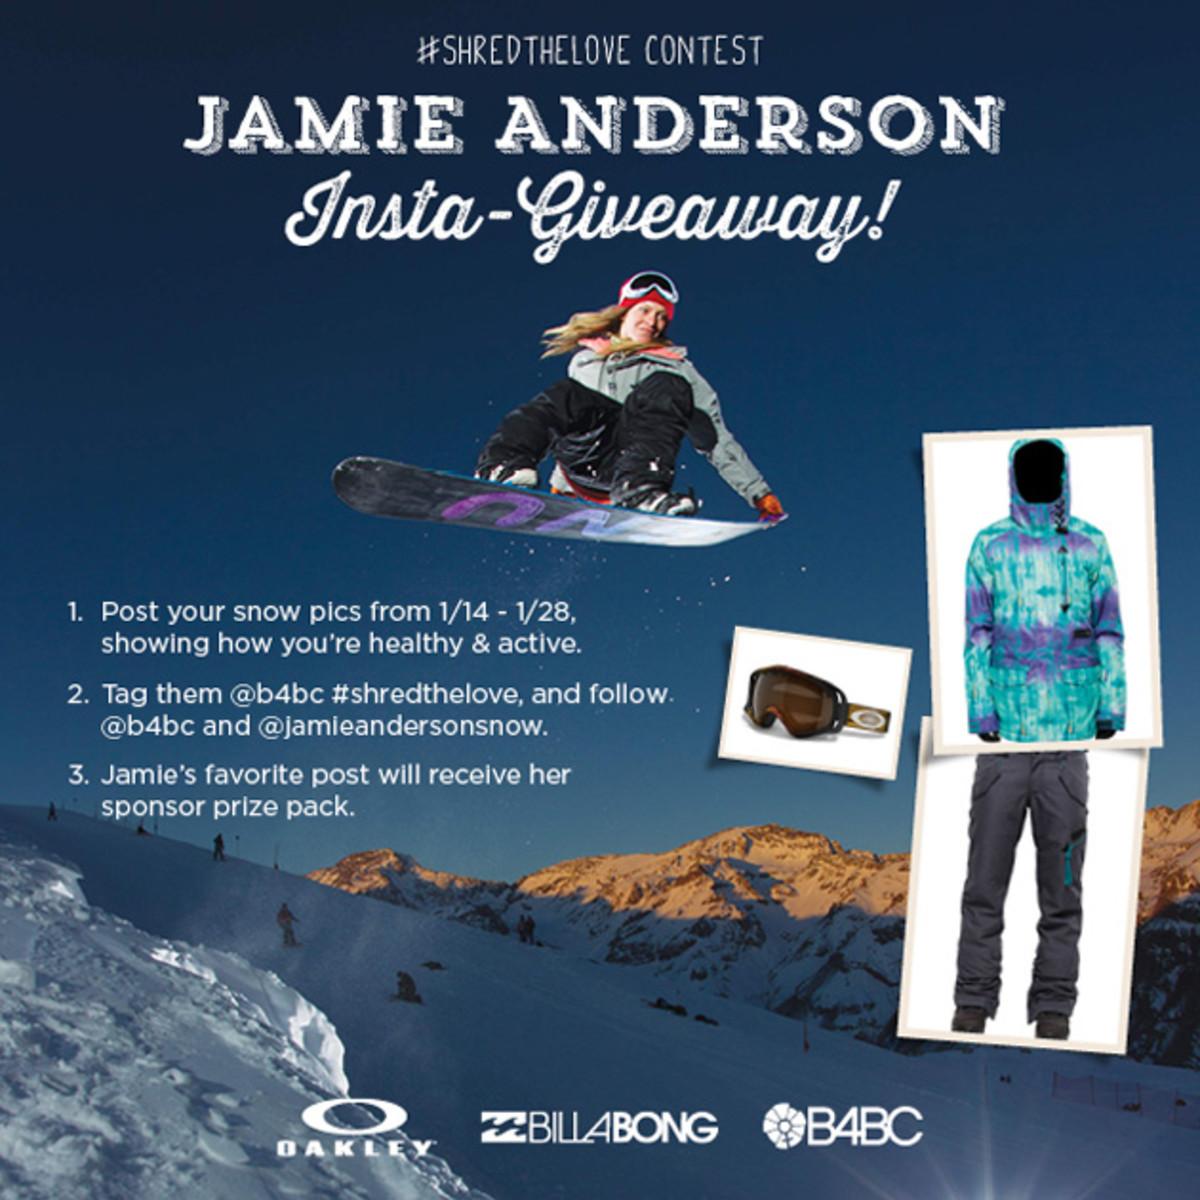 """#SHREDTHELOVE With Jamie Anderson"" Instragram Contest ..."